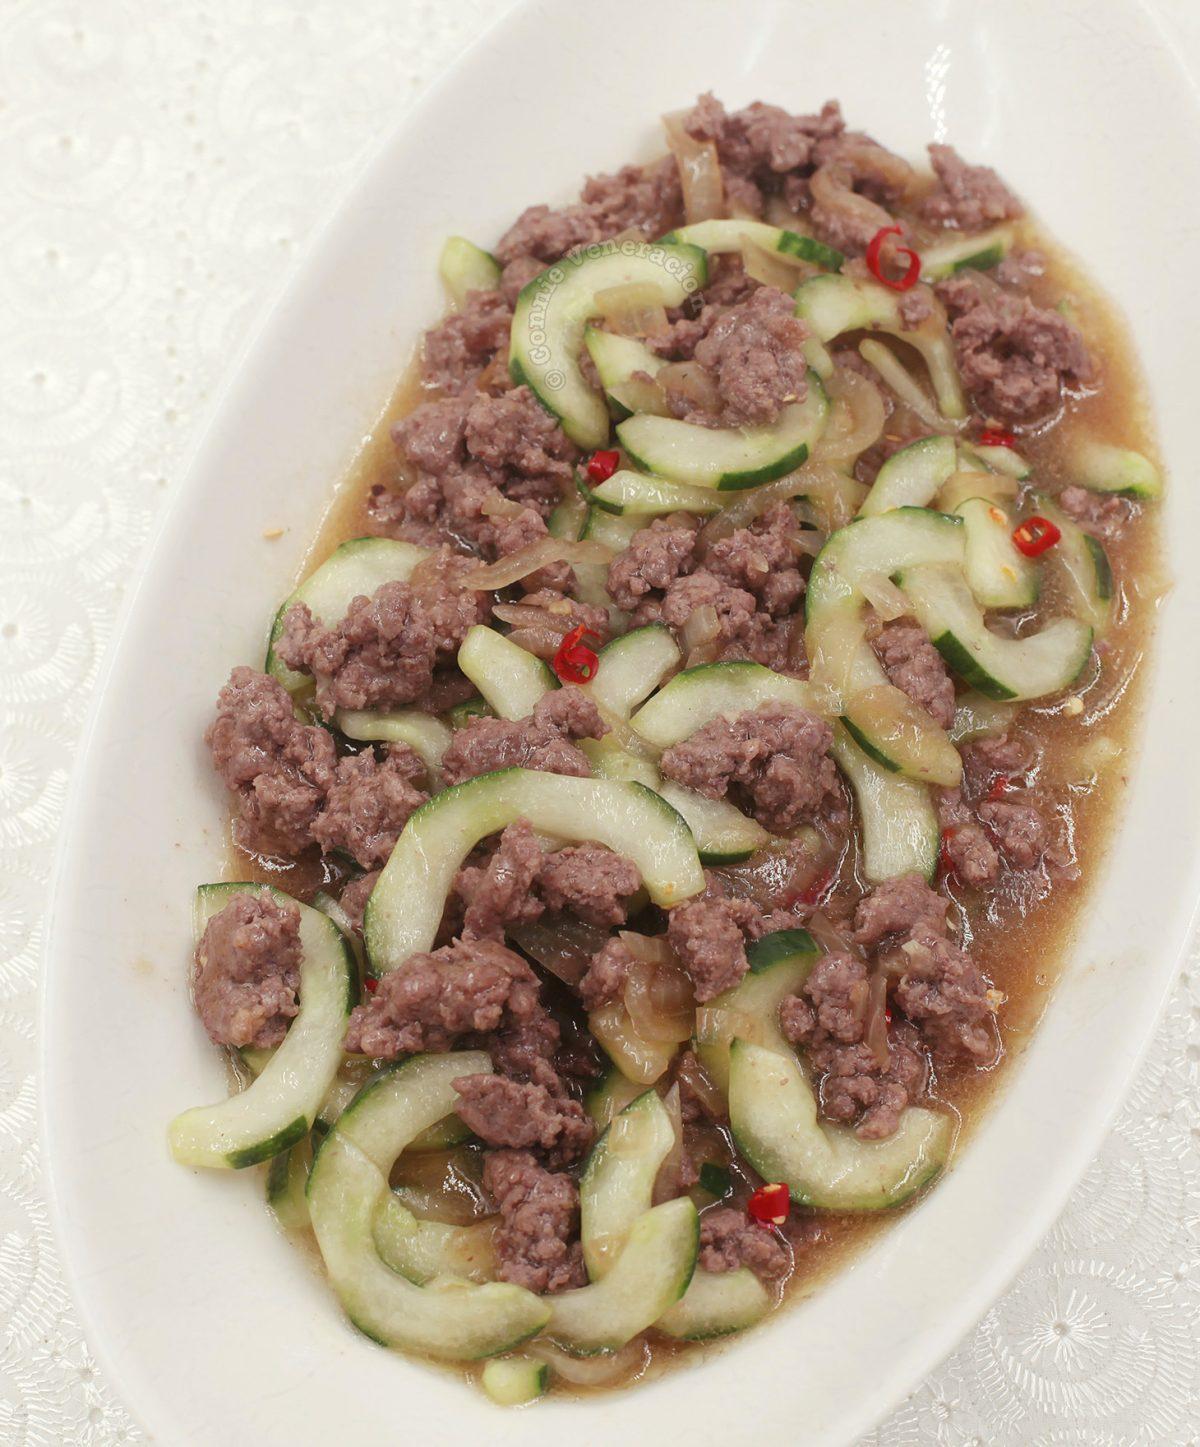 Cucumber and Ground Pork Stir Fry